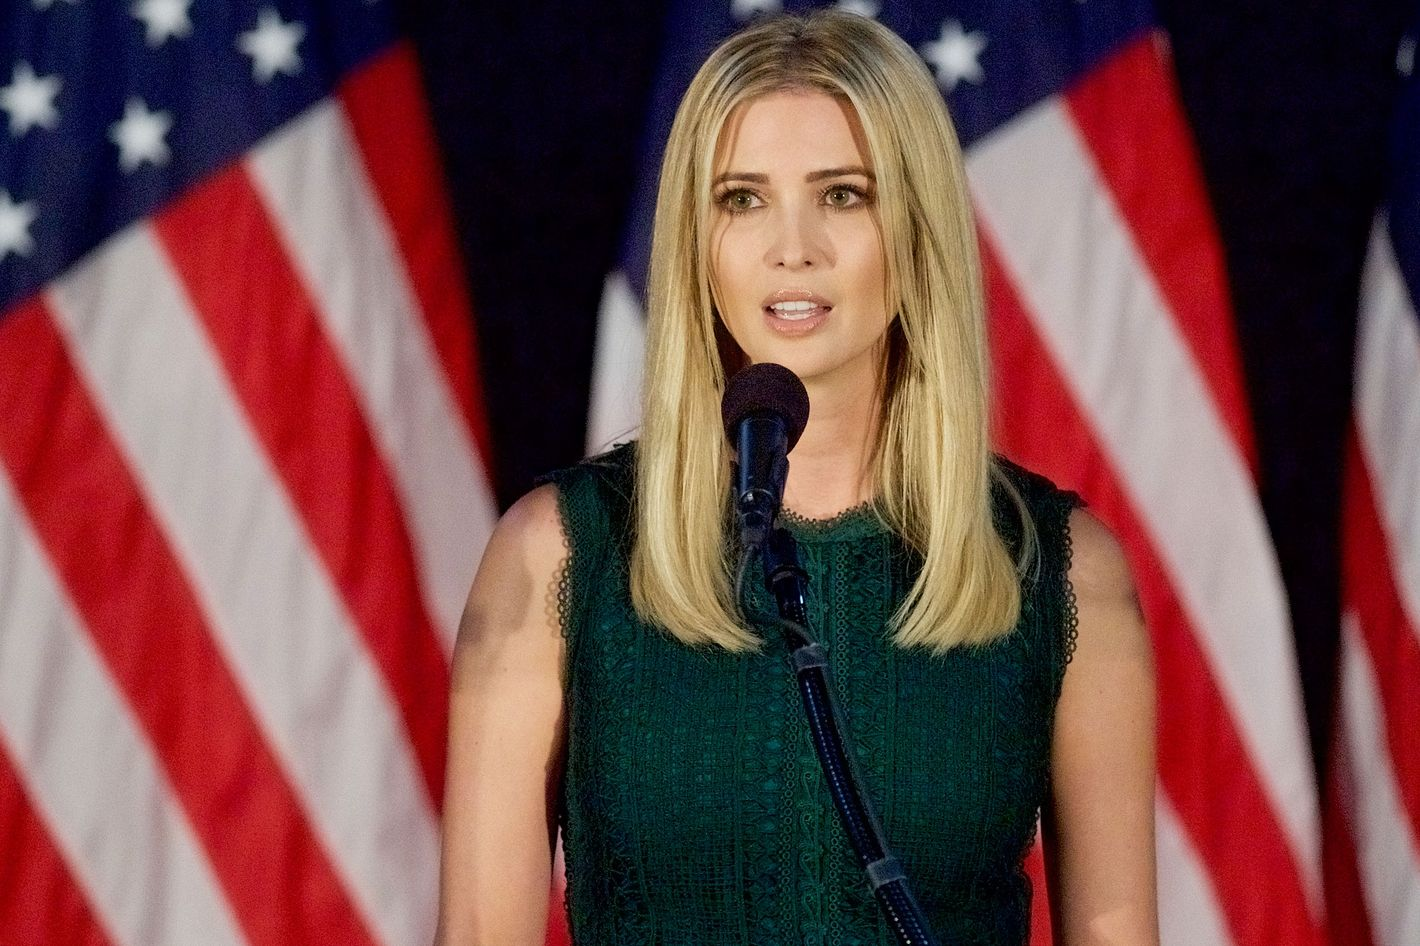 Ivanka Trump Finally Breaks Silence on Daddy Donald's Sexist Rants